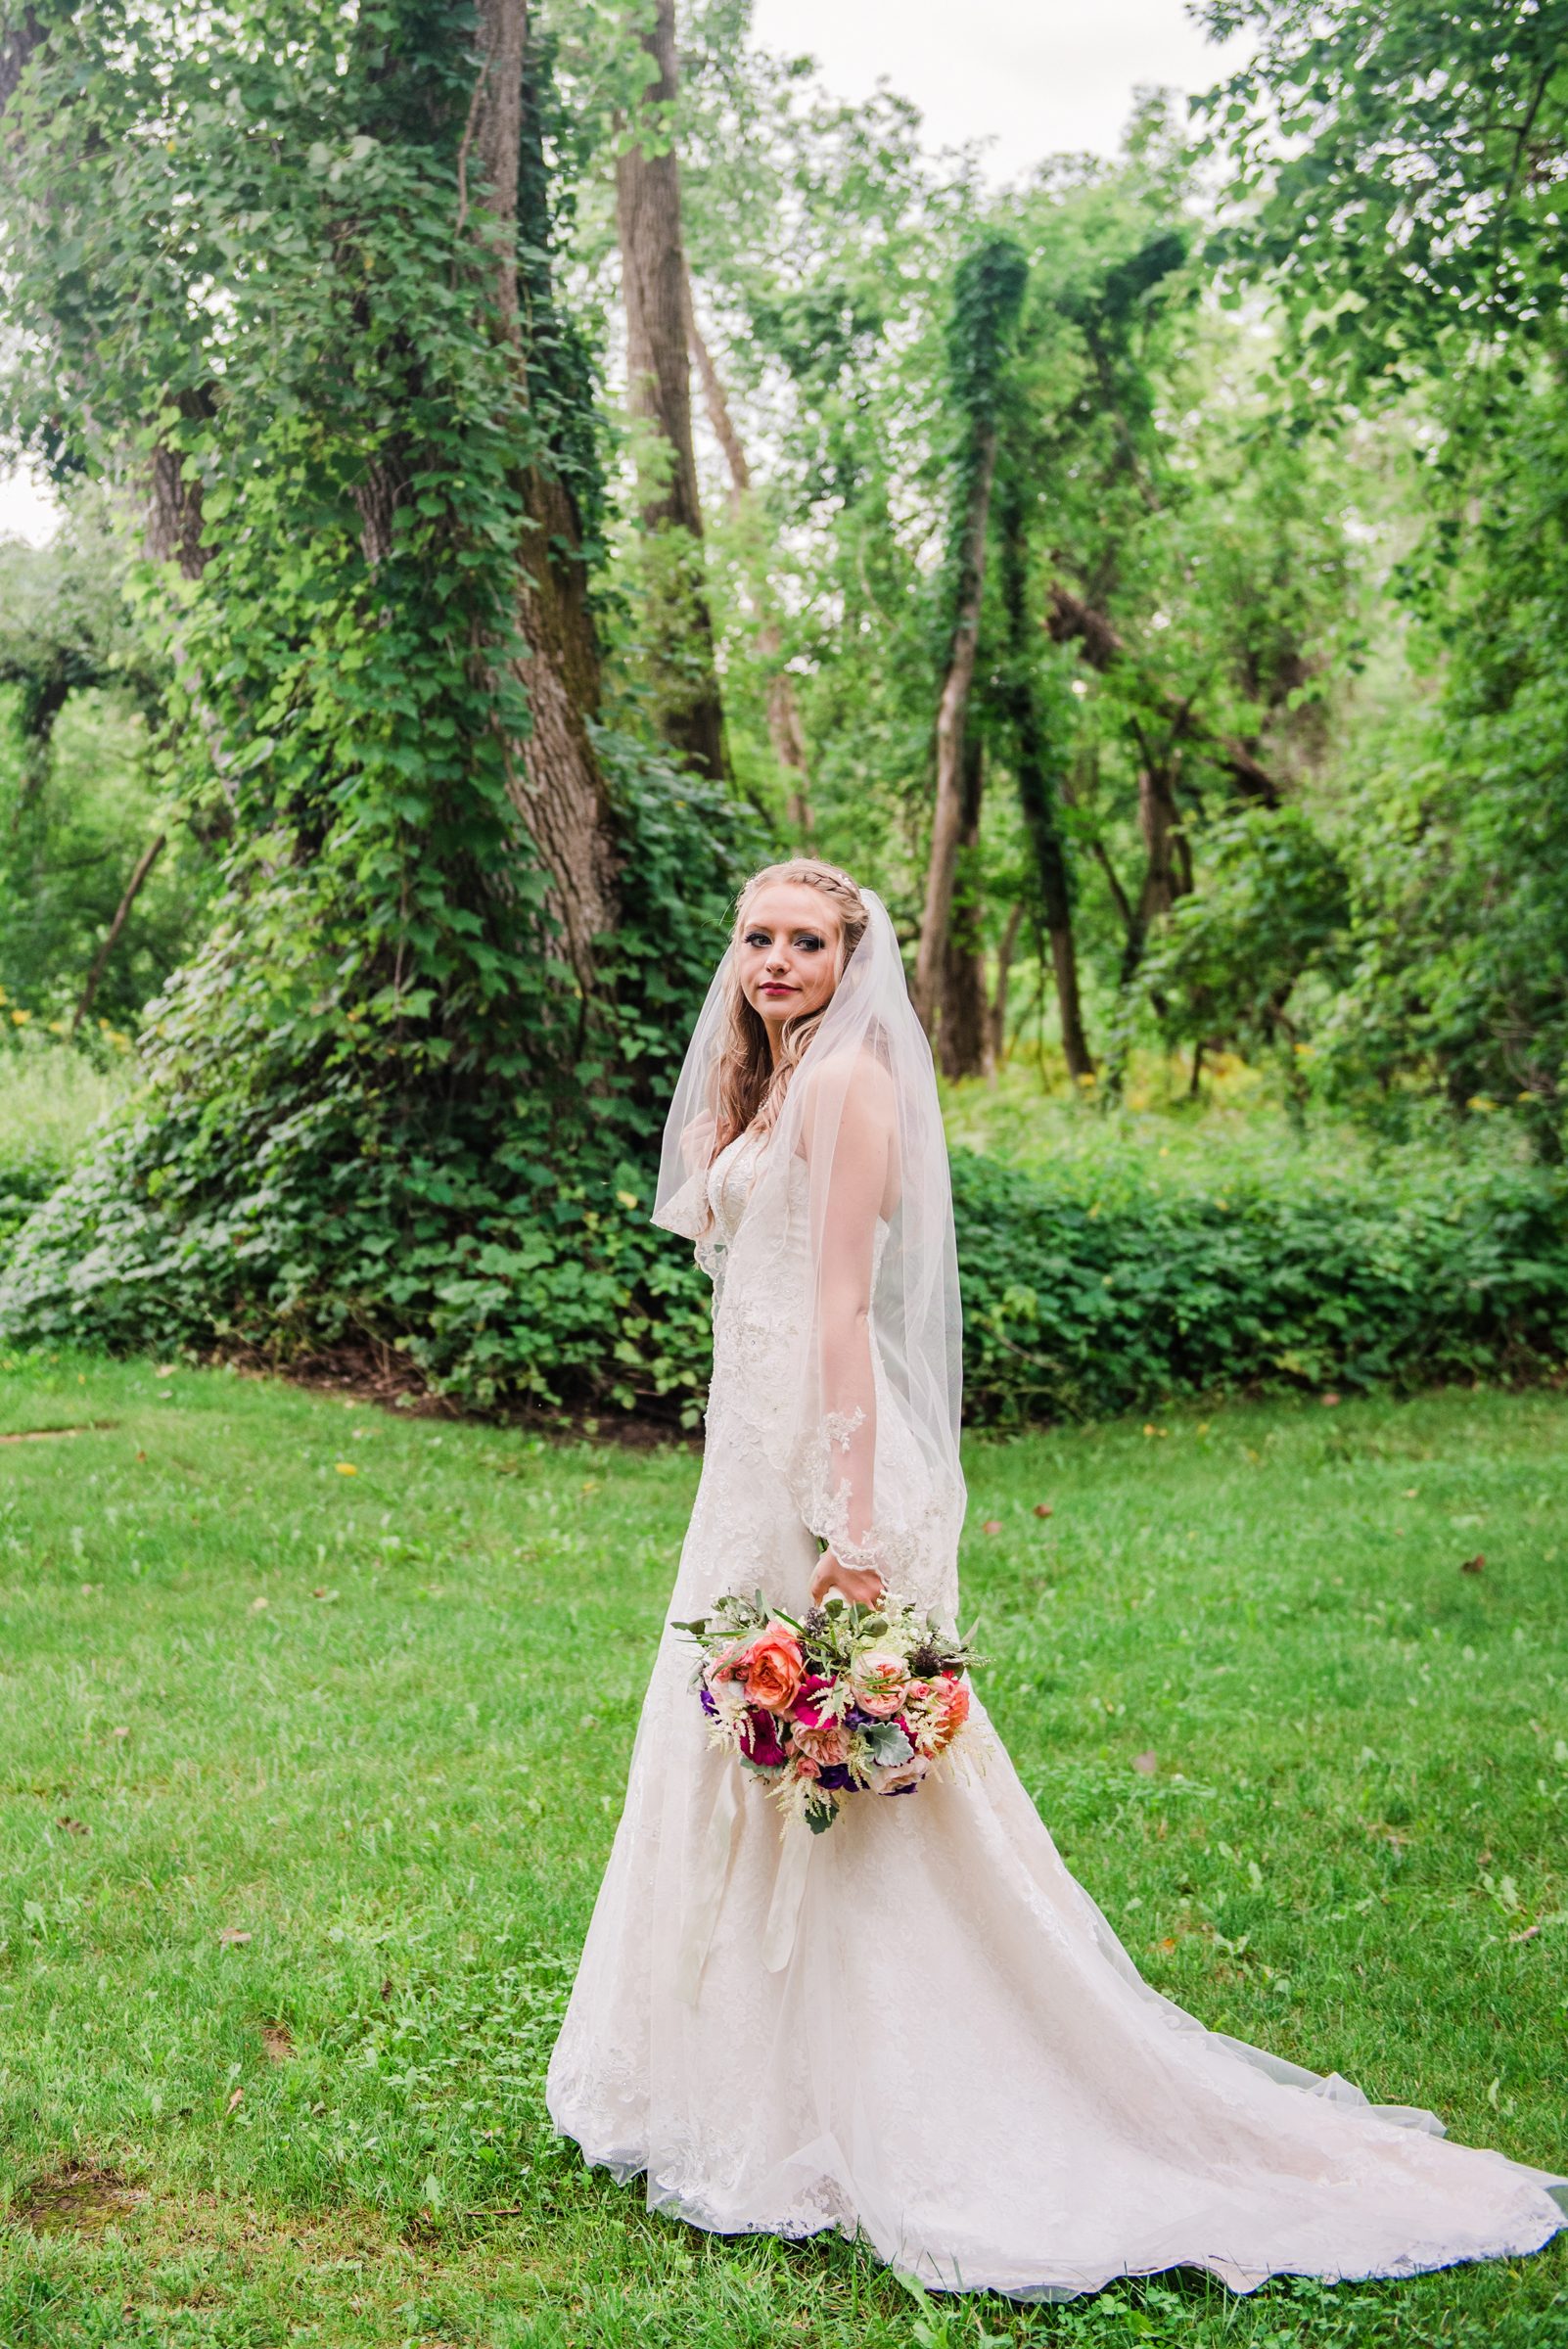 Wolf_Oak_Acres_Central_NY_Wedding_JILL_STUDIO_Rochester_NY_Photographer_DSC_8744.jpg